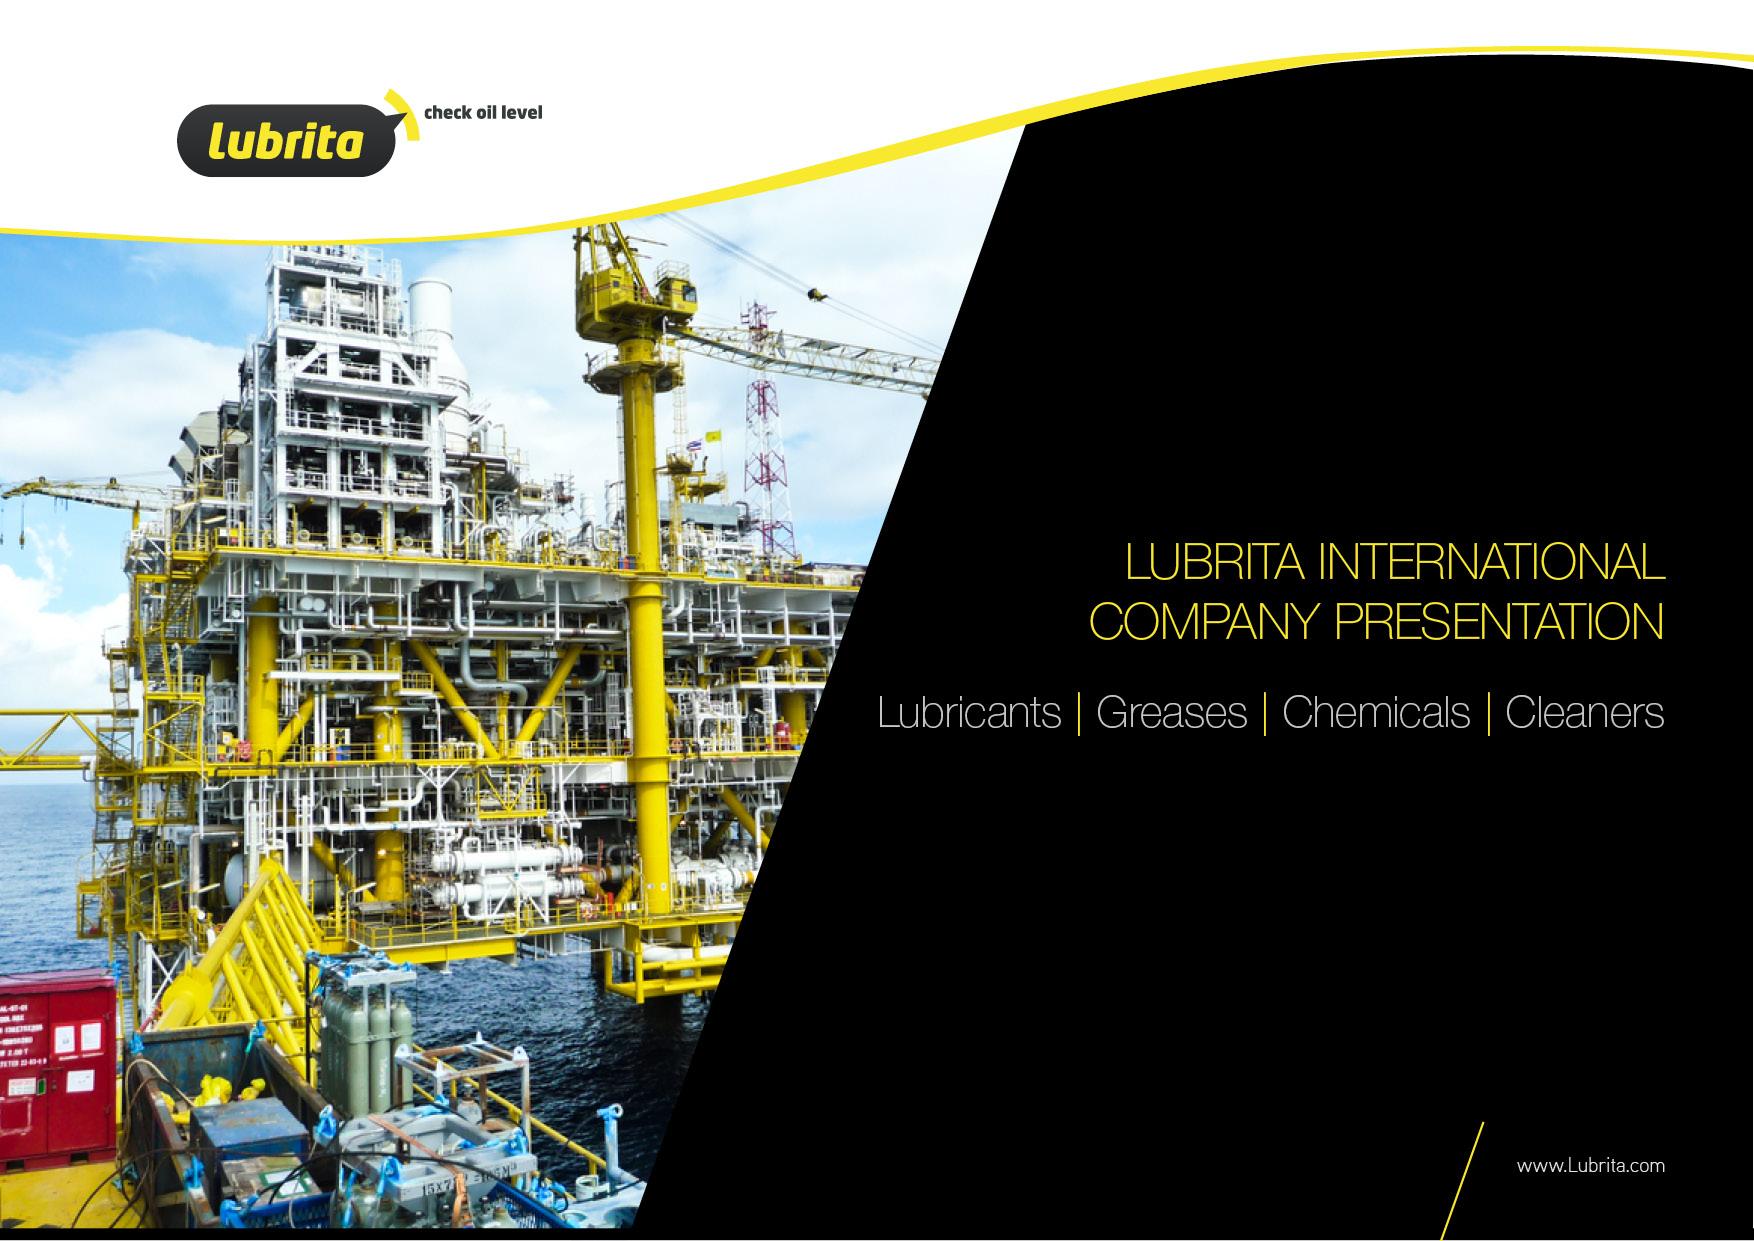 Lubrita-Presentation-RM-25-01-16_v4-01.jpg